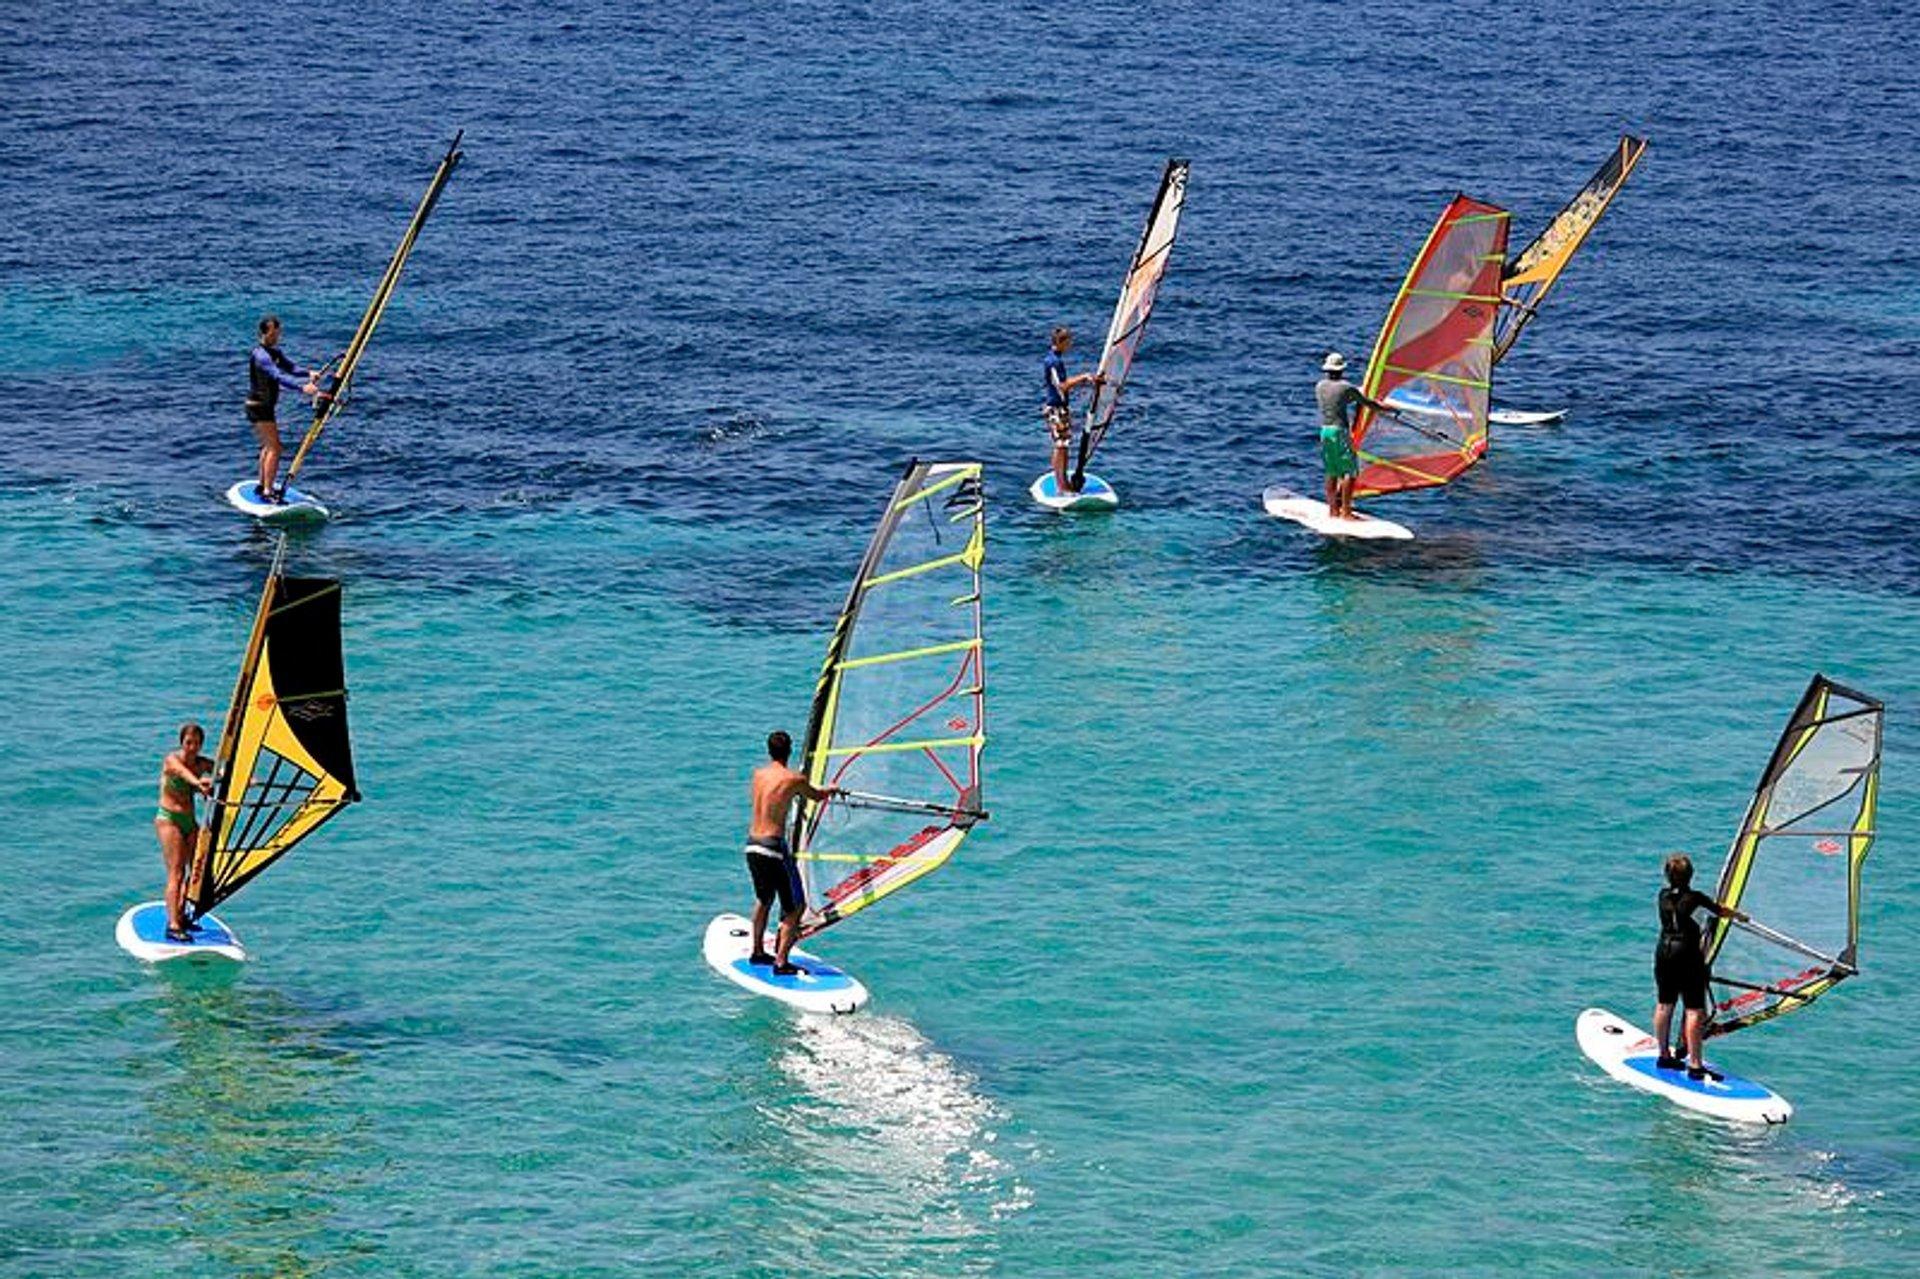 Kitesurfing and Windsurfing in Australia 2020 - Best Time